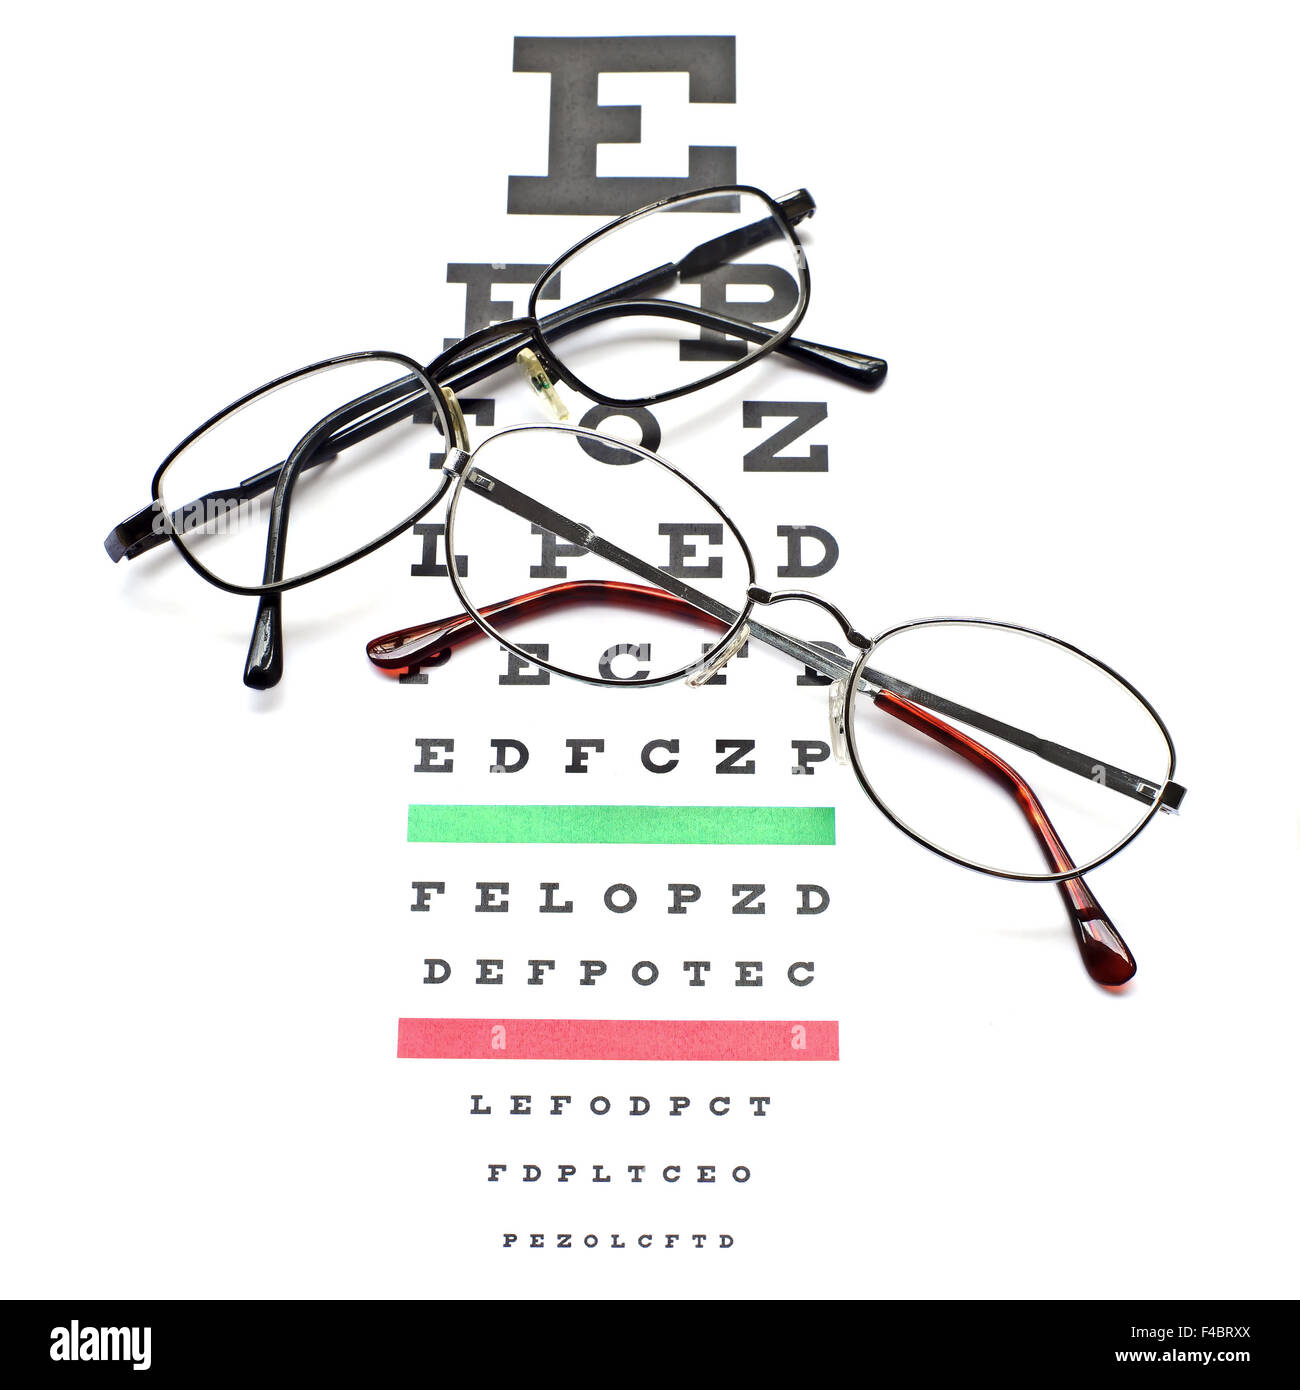 Glasses on snellen eye sight chart test background stock photo glasses on snellen eye sight chart test background nvjuhfo Images